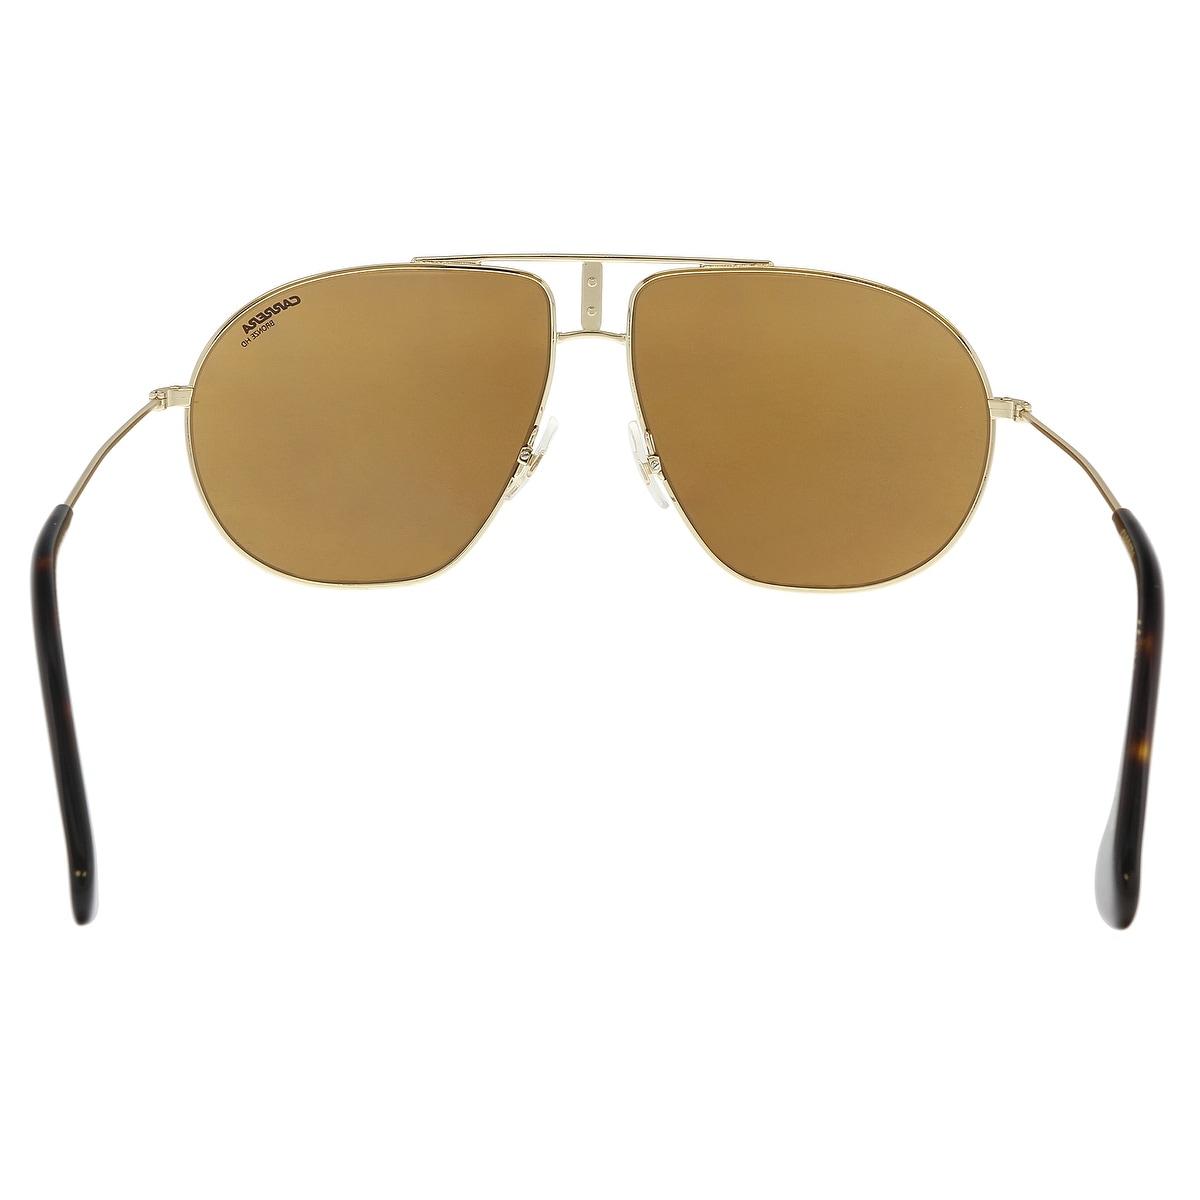 43a688799 Shop Carrera BOUNDS 0RHL-K1 Gold Black Aviator Sunglasses - 60-12-145 -  Free Shipping Today - Overstock - 21450467